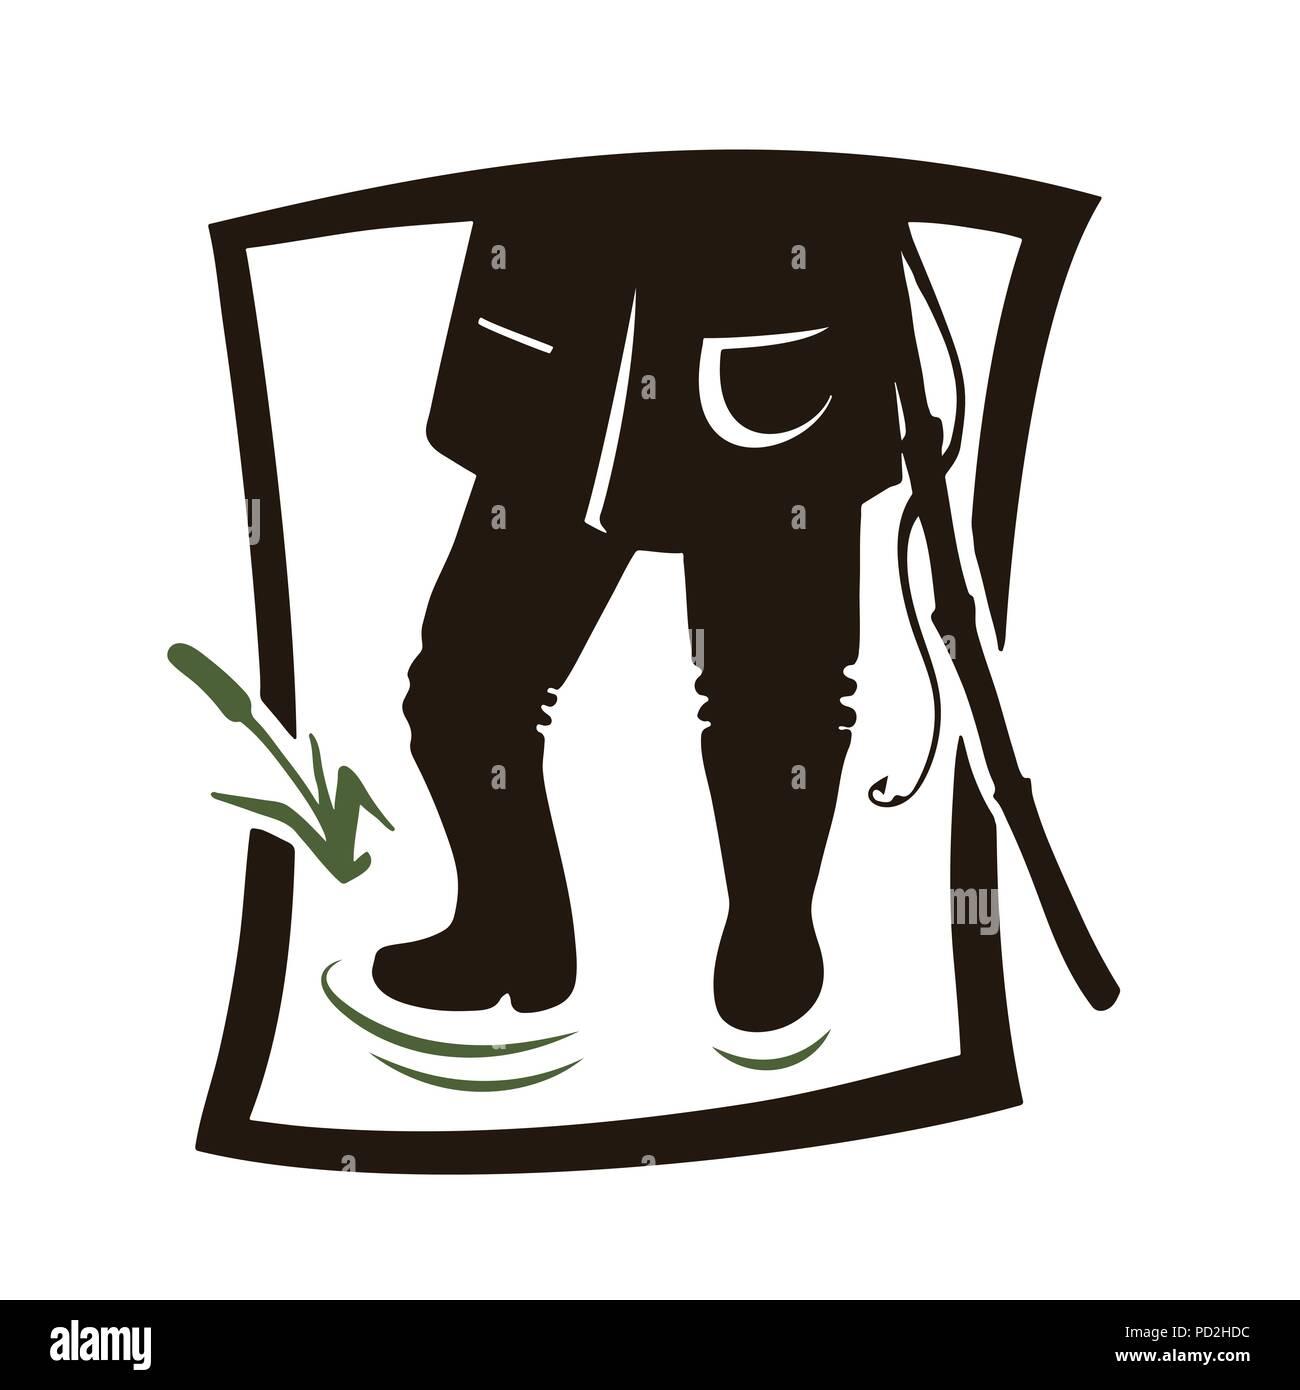 Fisher legs. Black icon on white background. Fishing vector illustration. - Stock Image